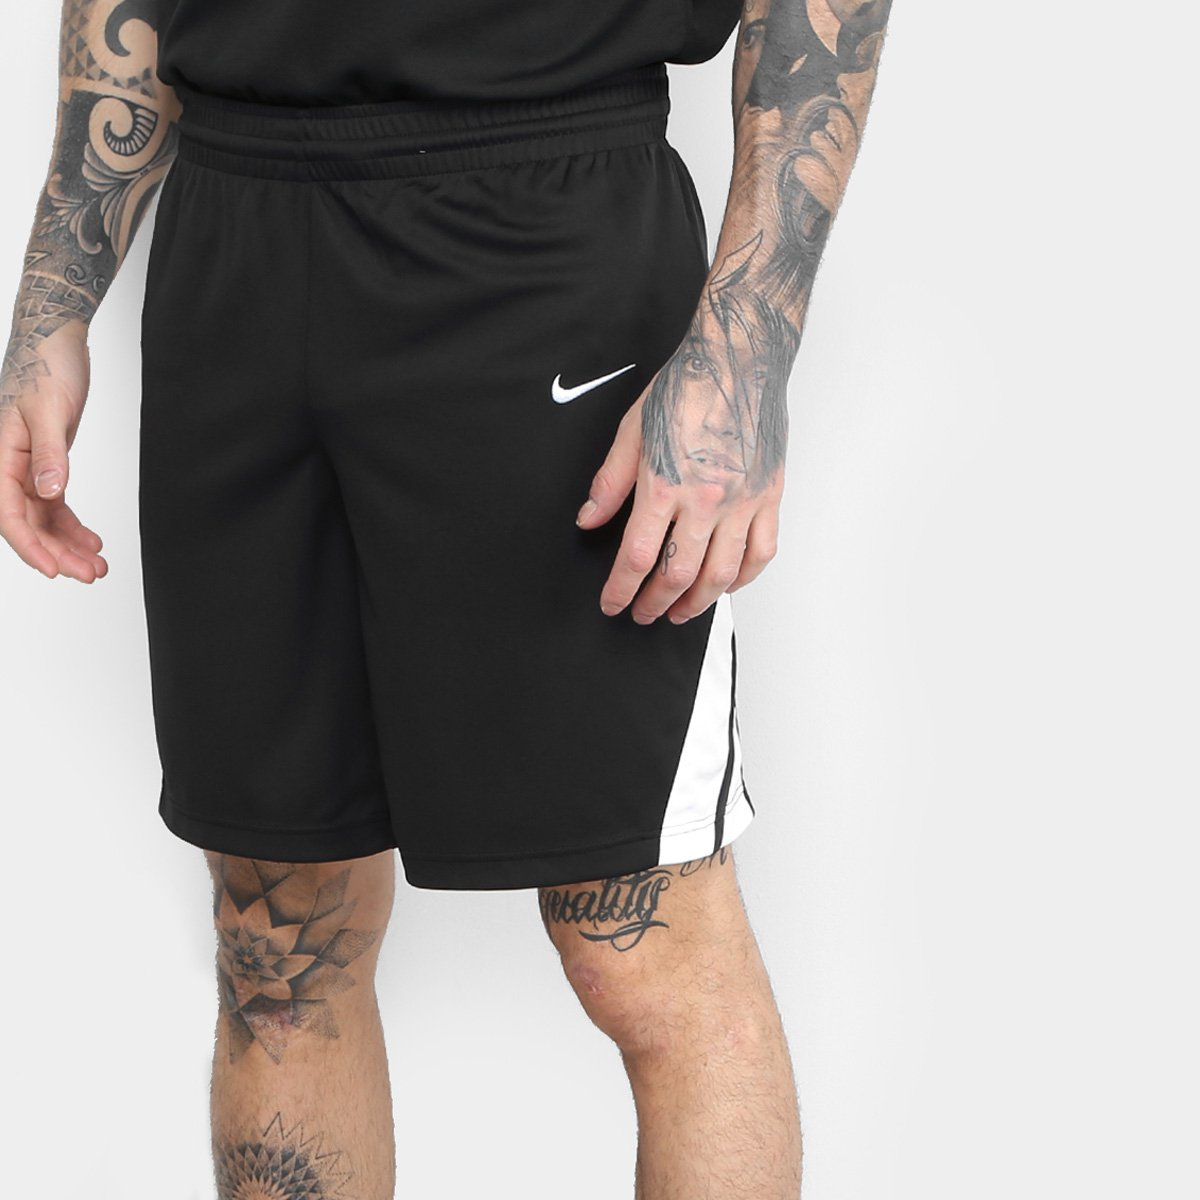 9879c38b26 Bermuda Nike Dri-Fit STK Masculina - Preto e Branco - Compre Agora ...